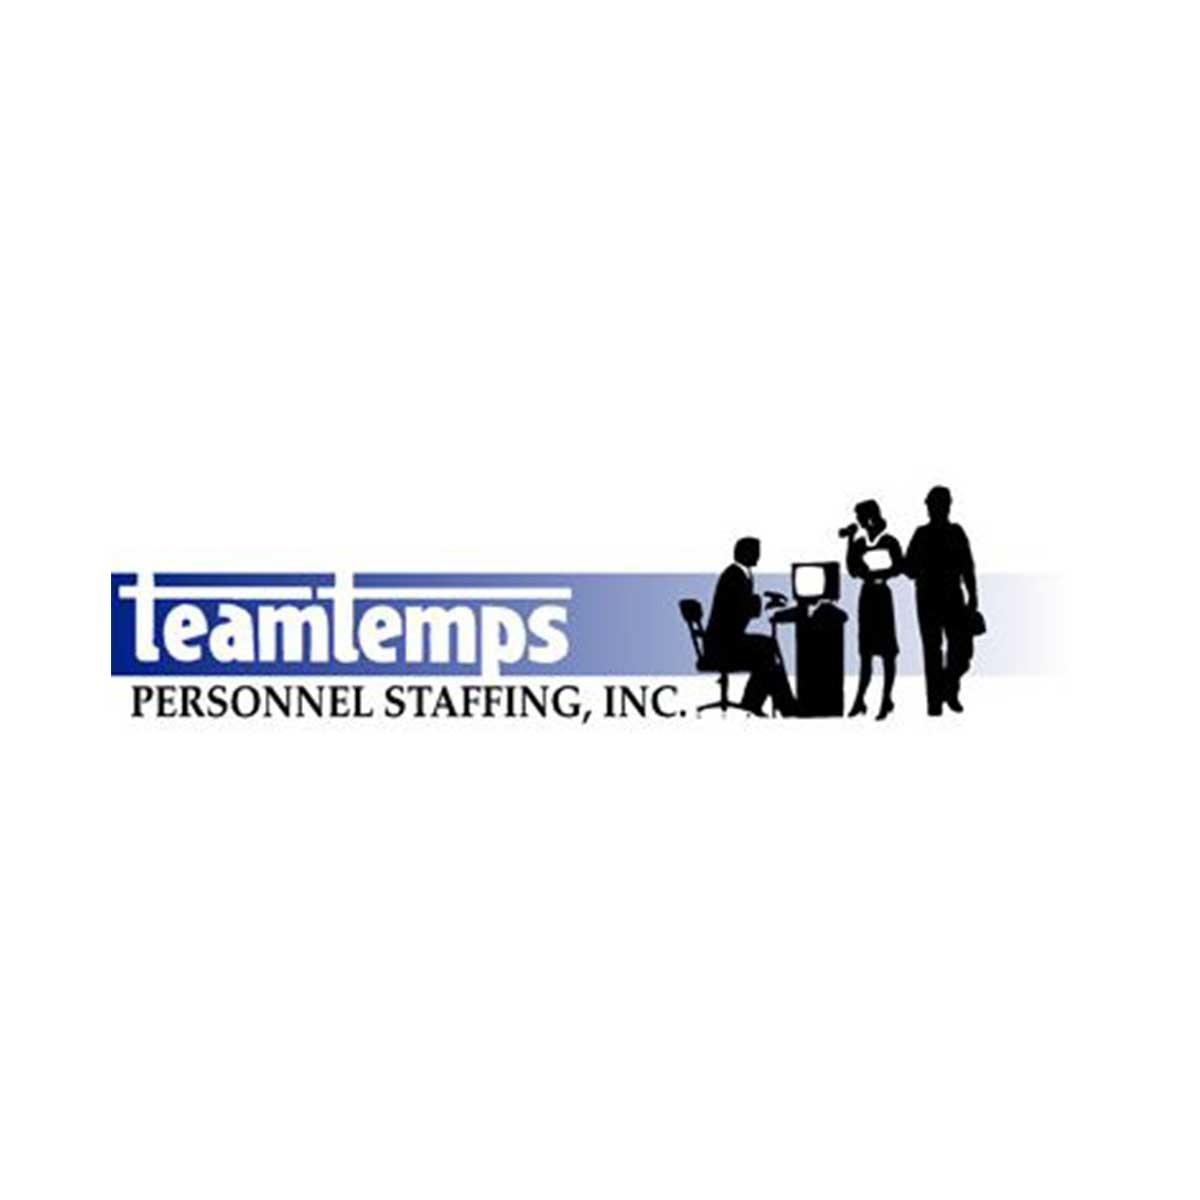 Teamtemps Personnel Staffing